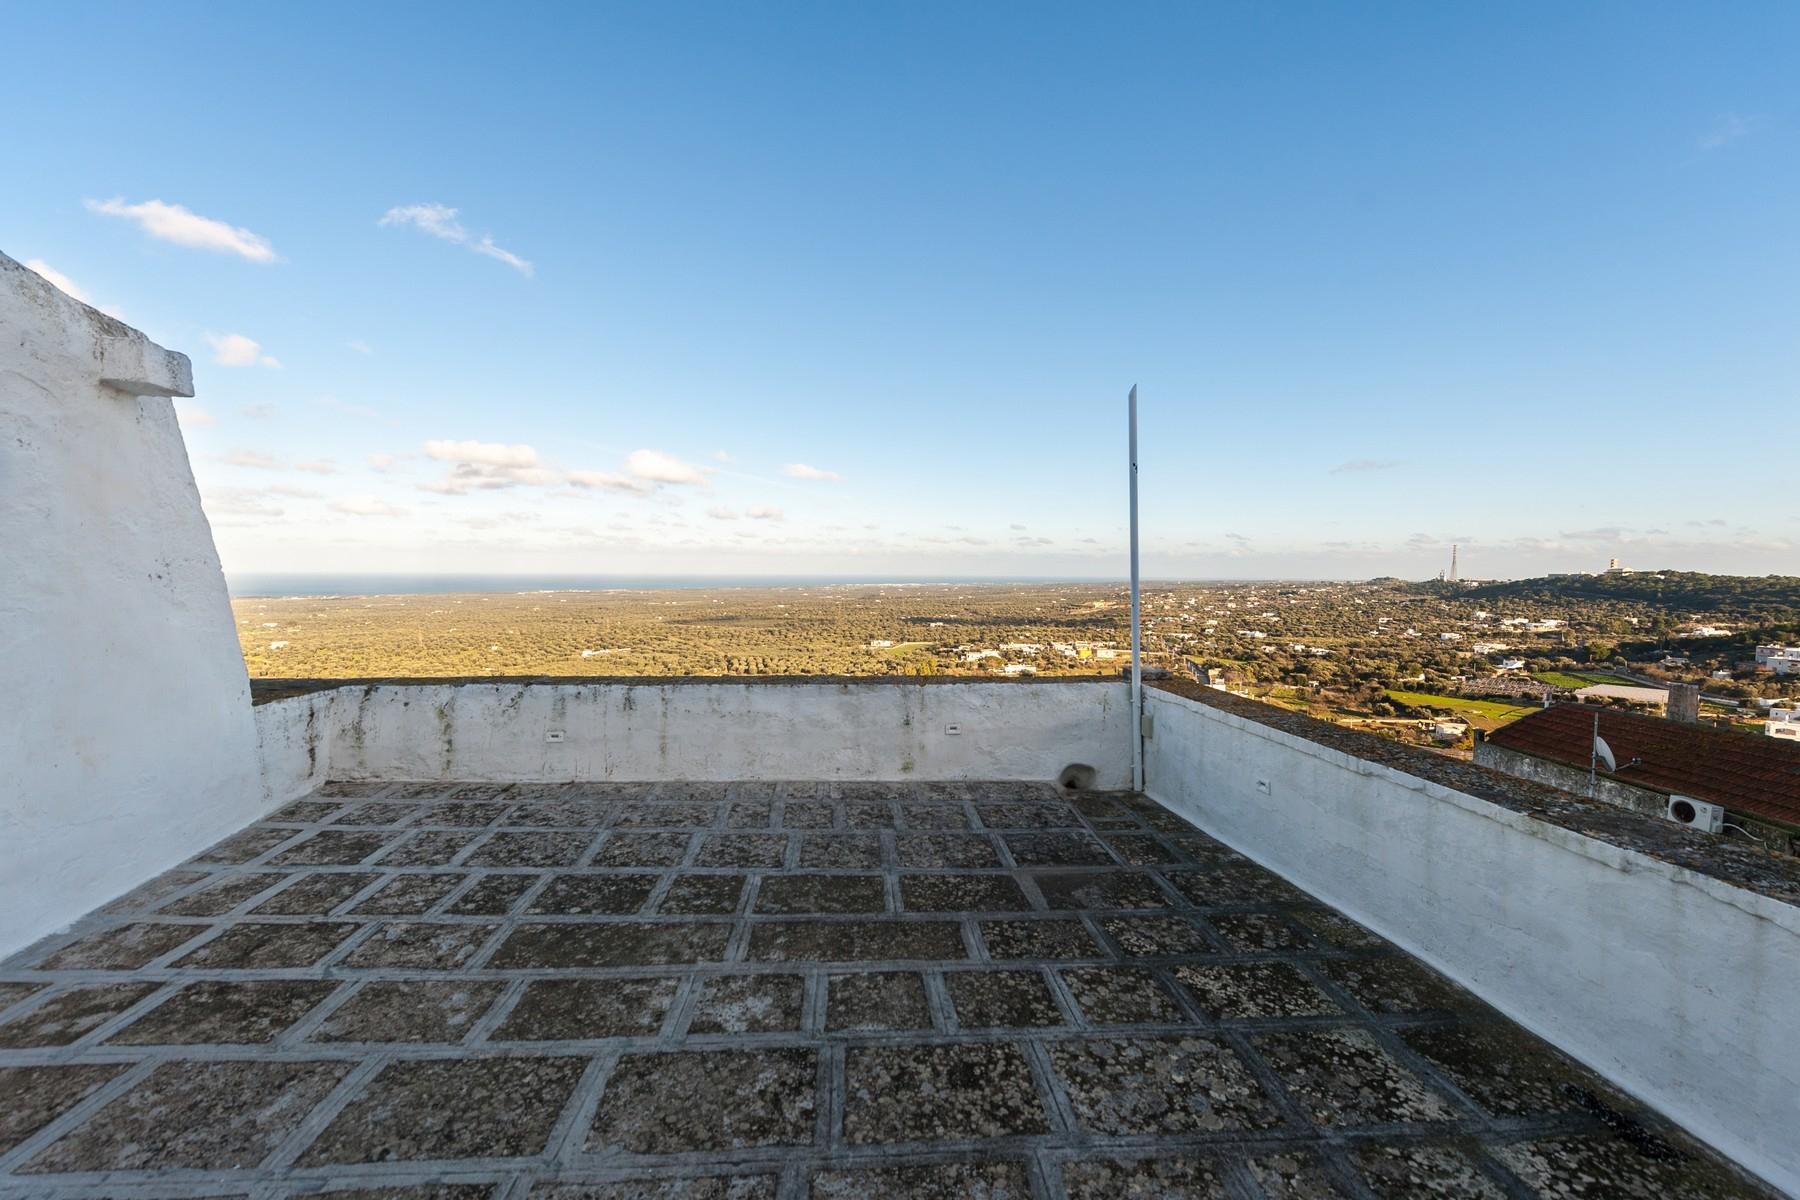 Appartamento in Vendita a Ostuni: 5 locali, 265 mq - Foto 13